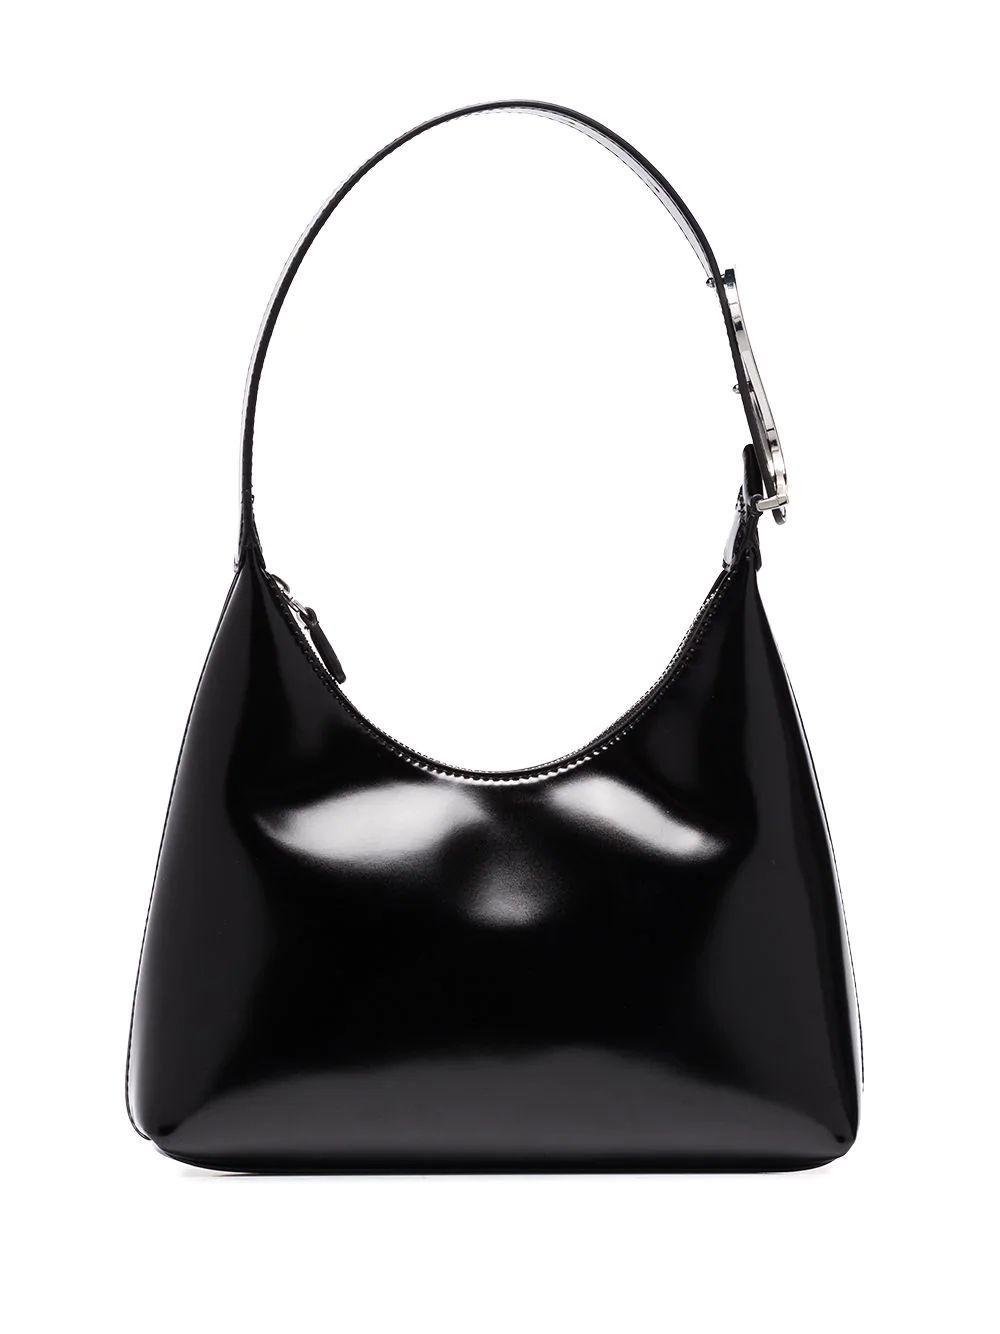 Scotty Bag Item # 292-9360